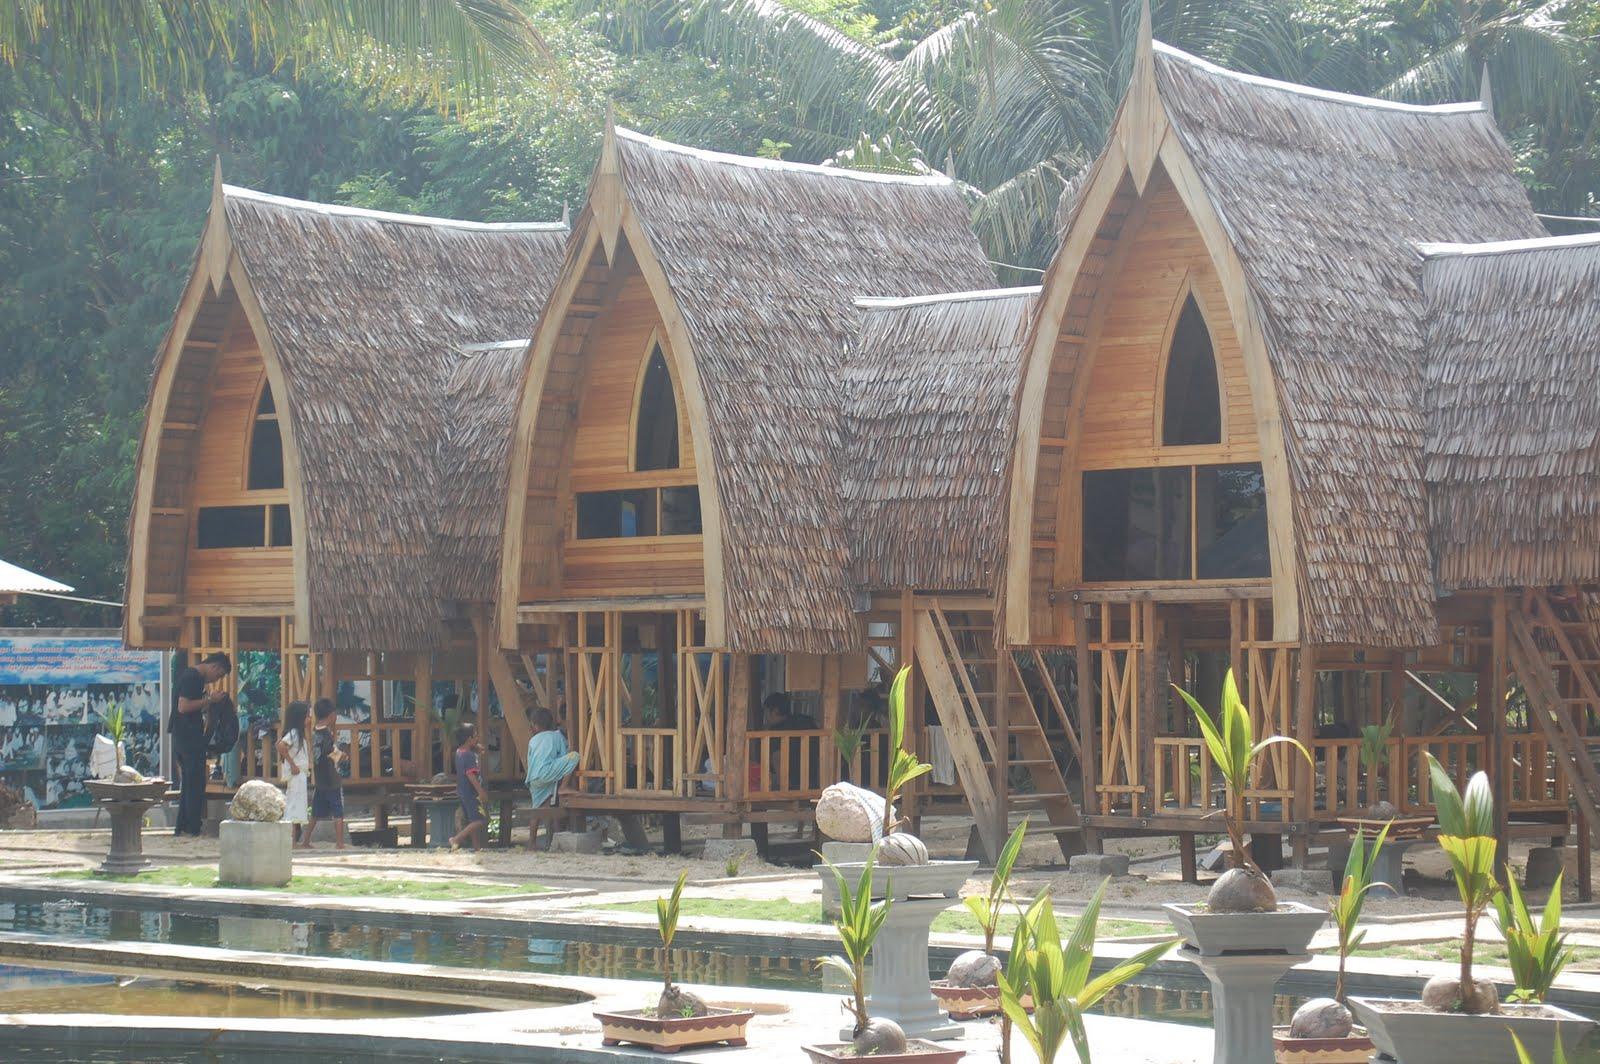 Desa Bubohu Wisata Religius Gorontalo Tradisi Walima Maulid Nabi Rumah